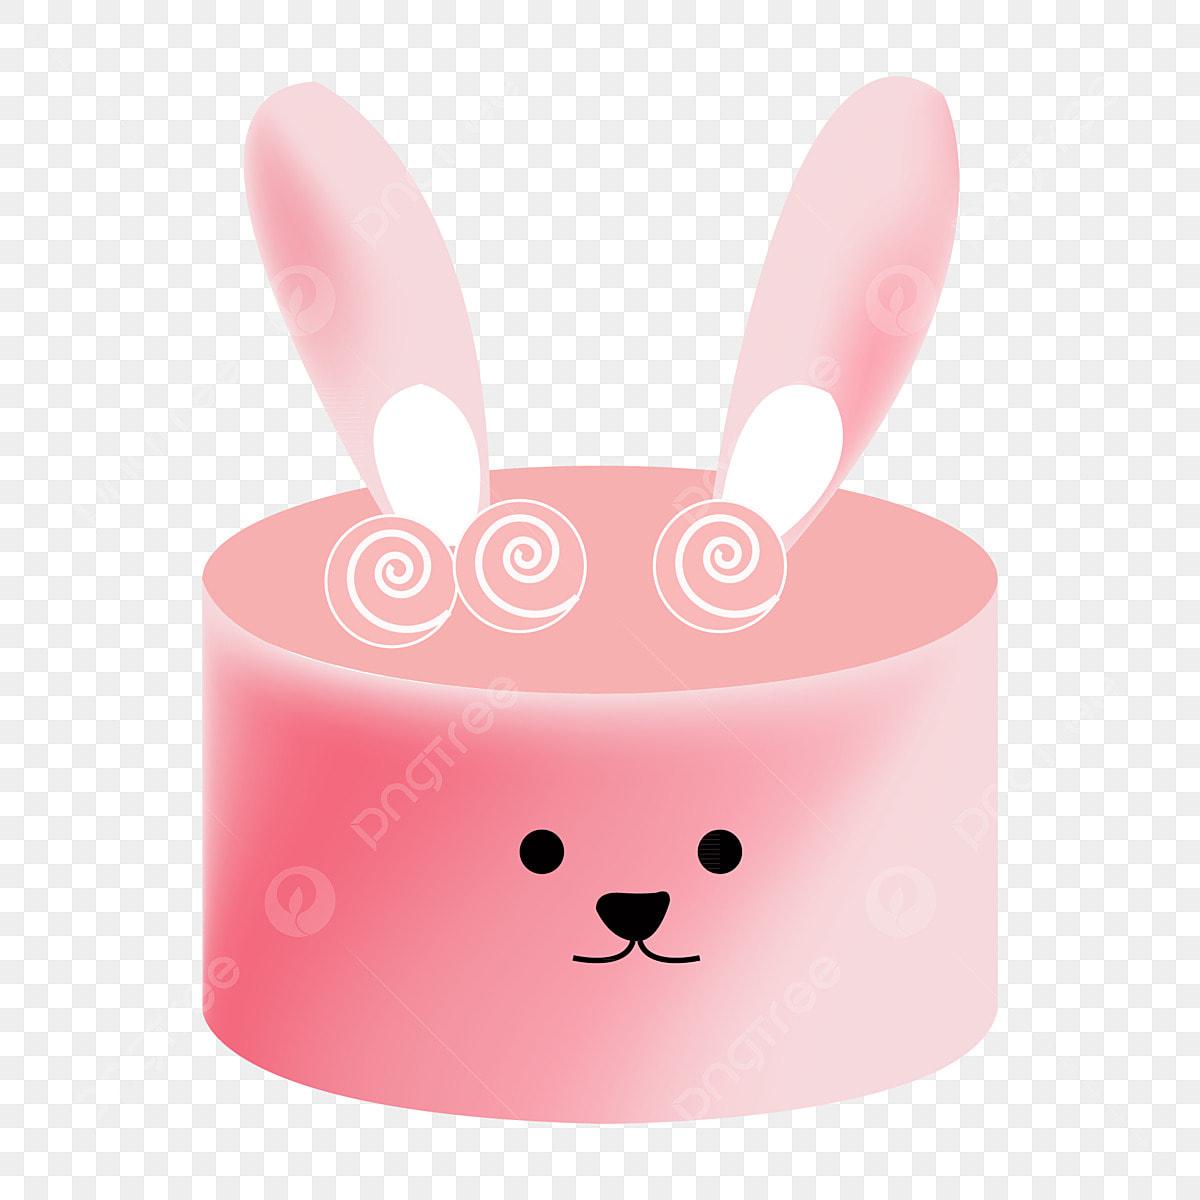 Enjoyable Pink Bunny Birthday Cake Birthday Cake Sweets Celebration Png Personalised Birthday Cards Veneteletsinfo